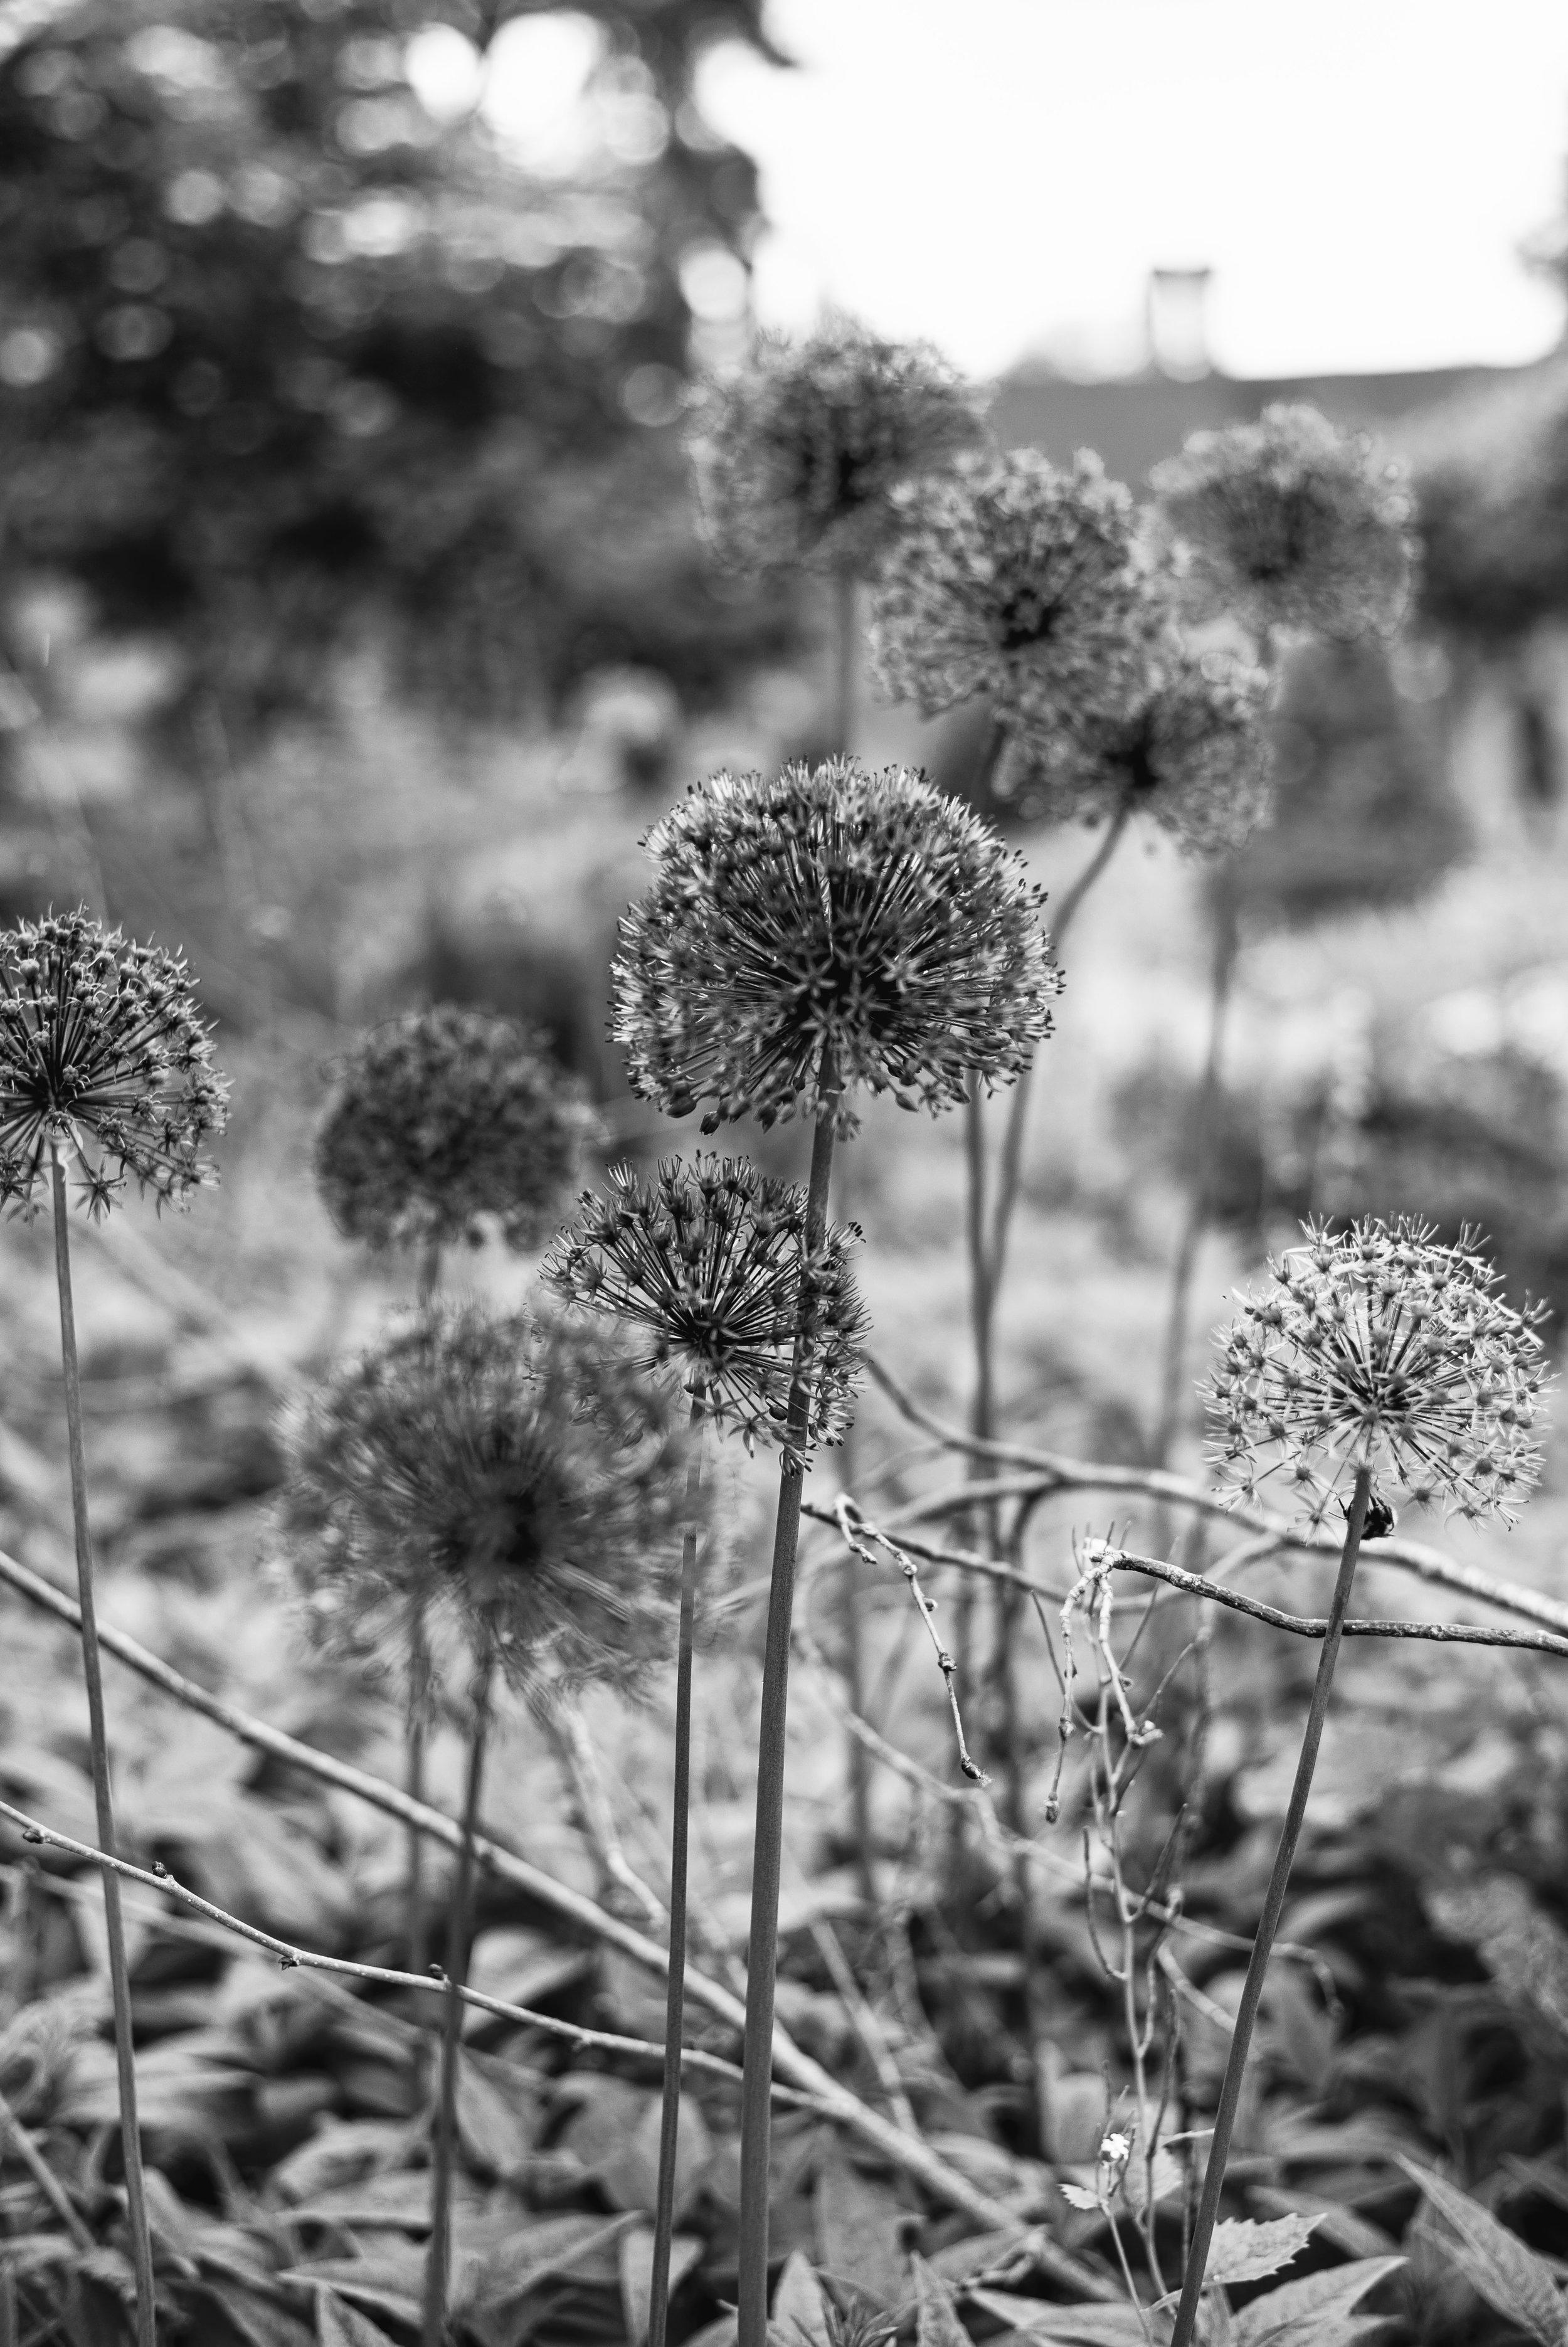 Gardens - Clifford Darby 2019